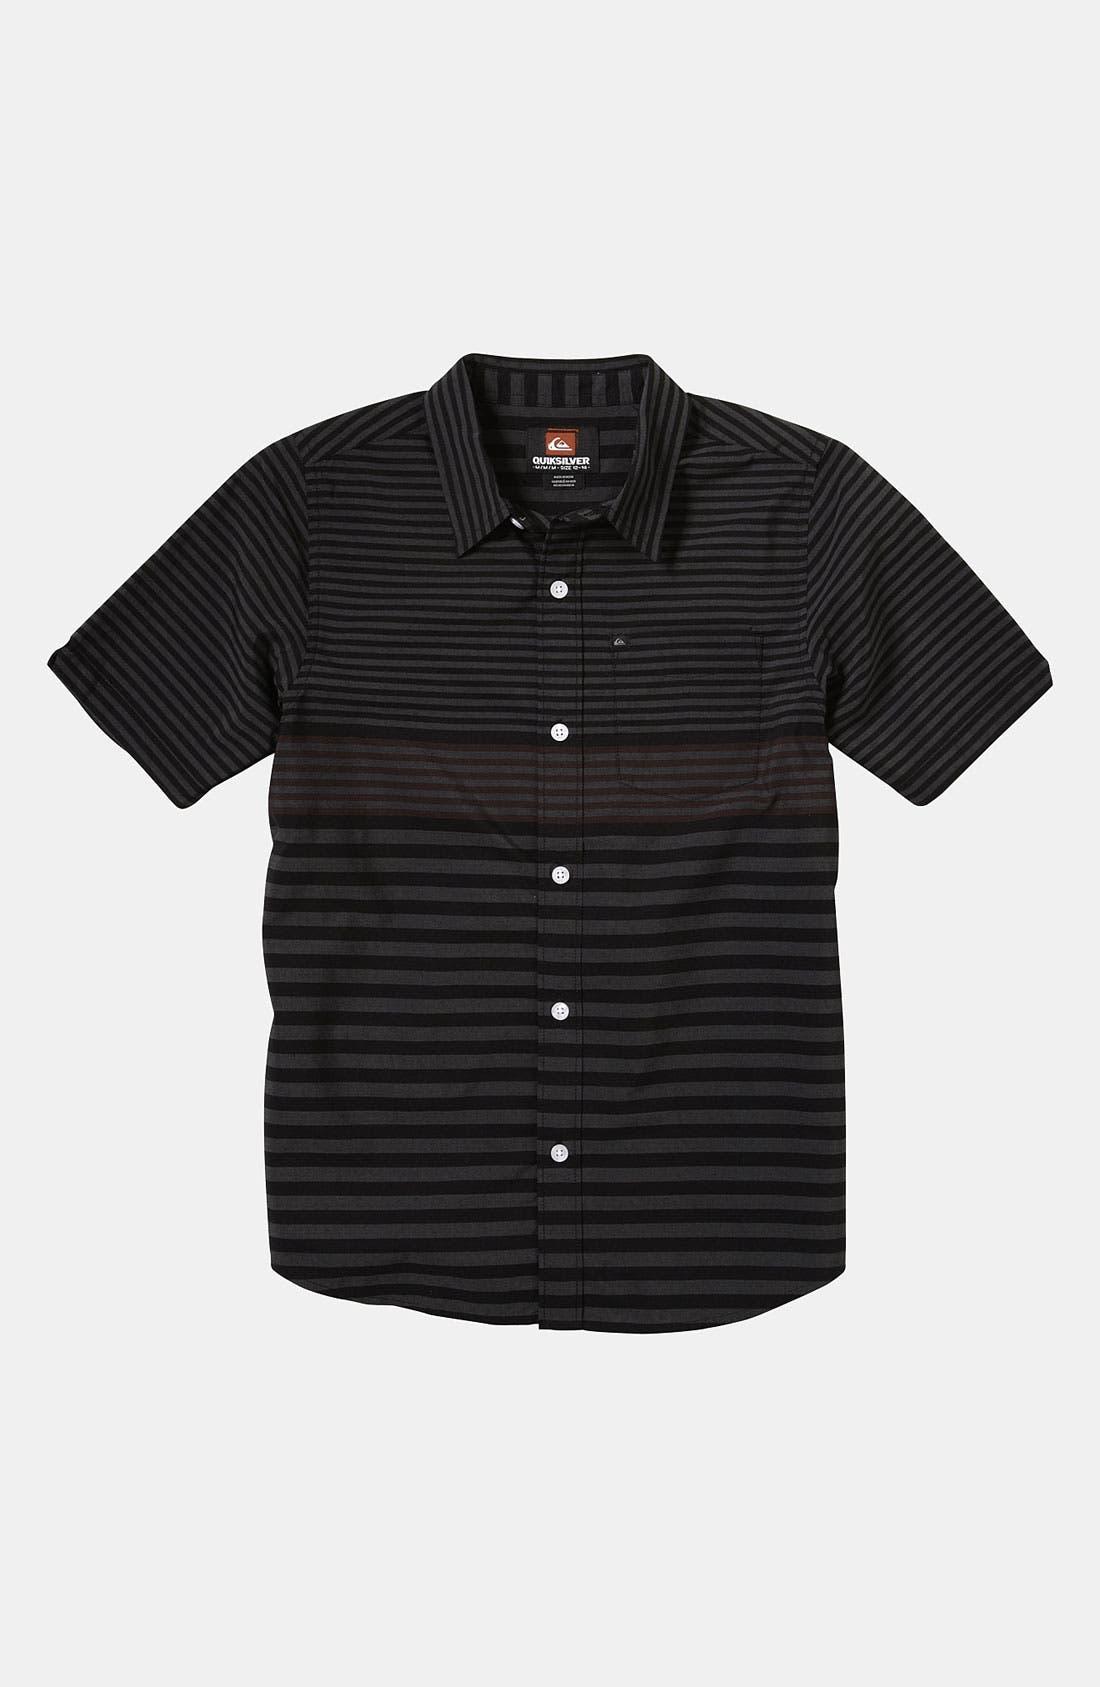 Main Image - Quiksilver 'Moving Seats' Woven Shirt (Big Boys)